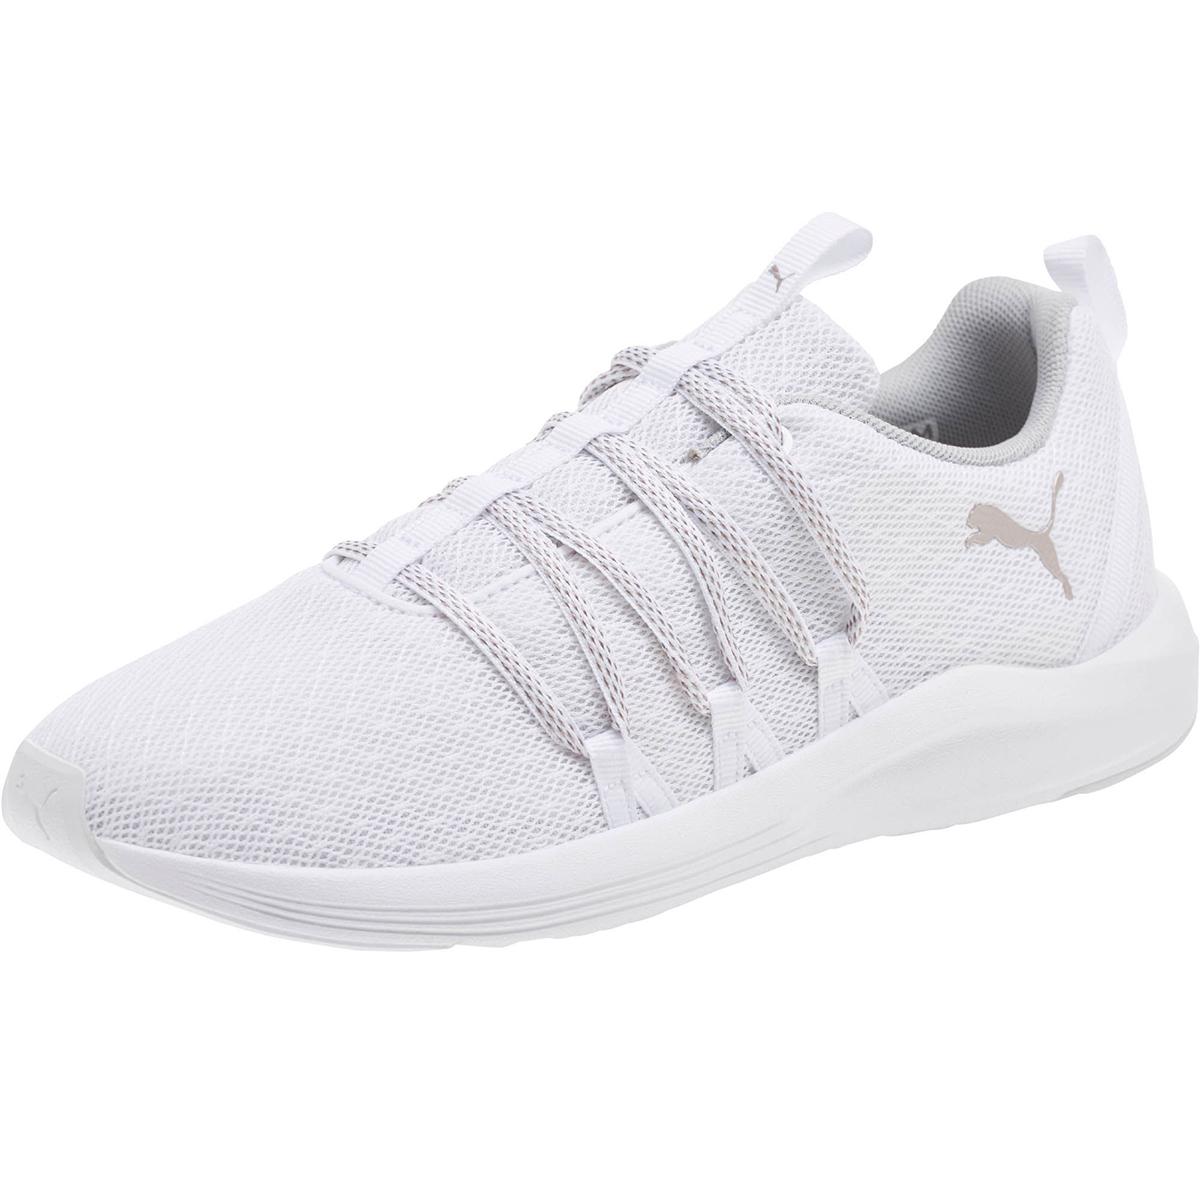 Puma Women's Prowl Alt Knit Running Shoes - White, 6